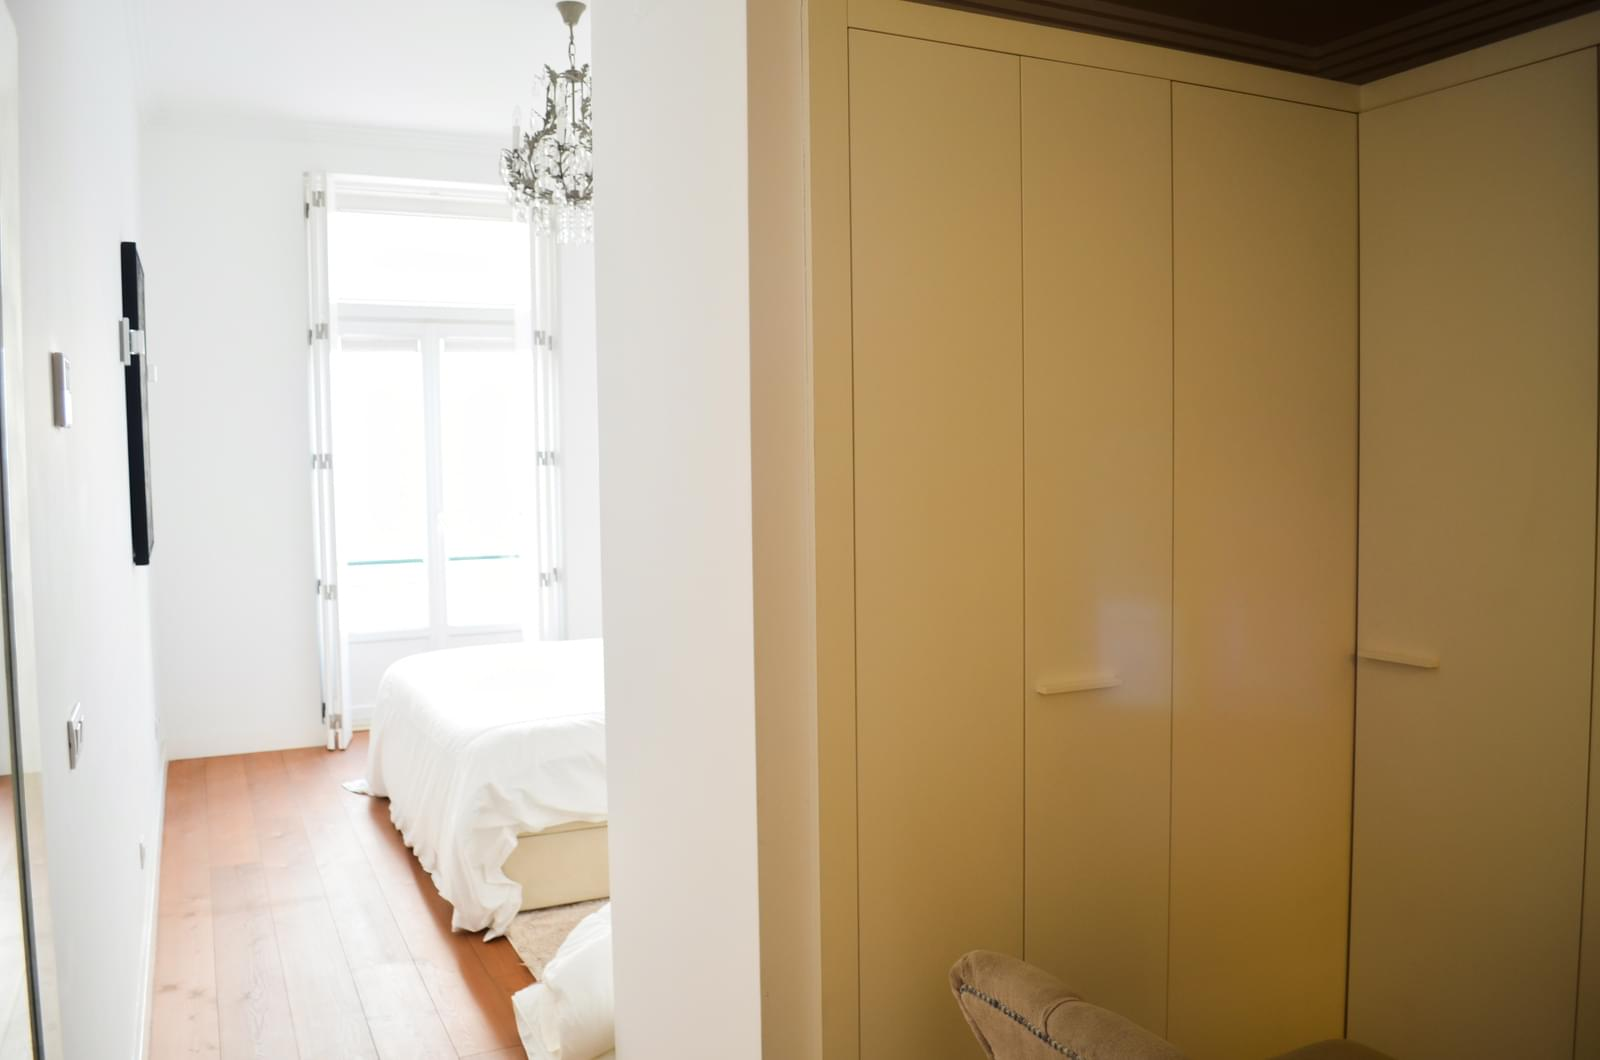 pf18712-apartamento-t2-lisboa-09317386-9cf3-467c-936b-680aa3ea9282